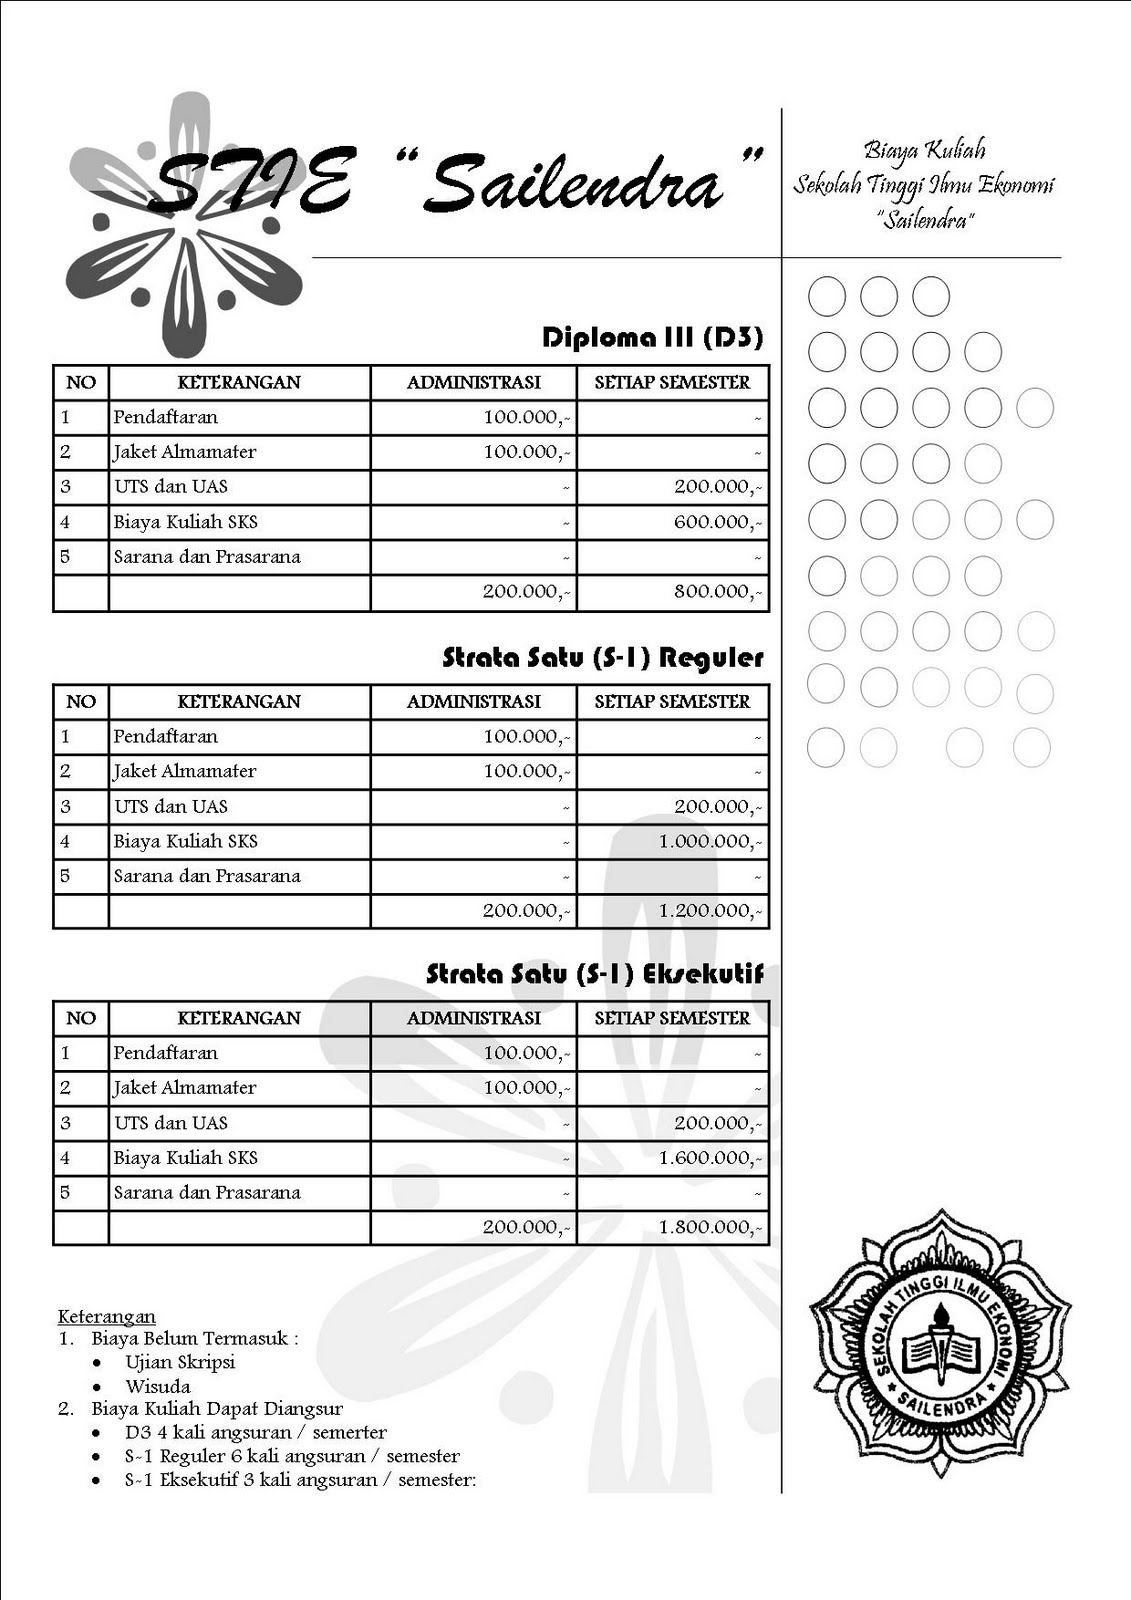 Sekolah Tinggi Ilmu Ekonomi Sailendra Jakarta